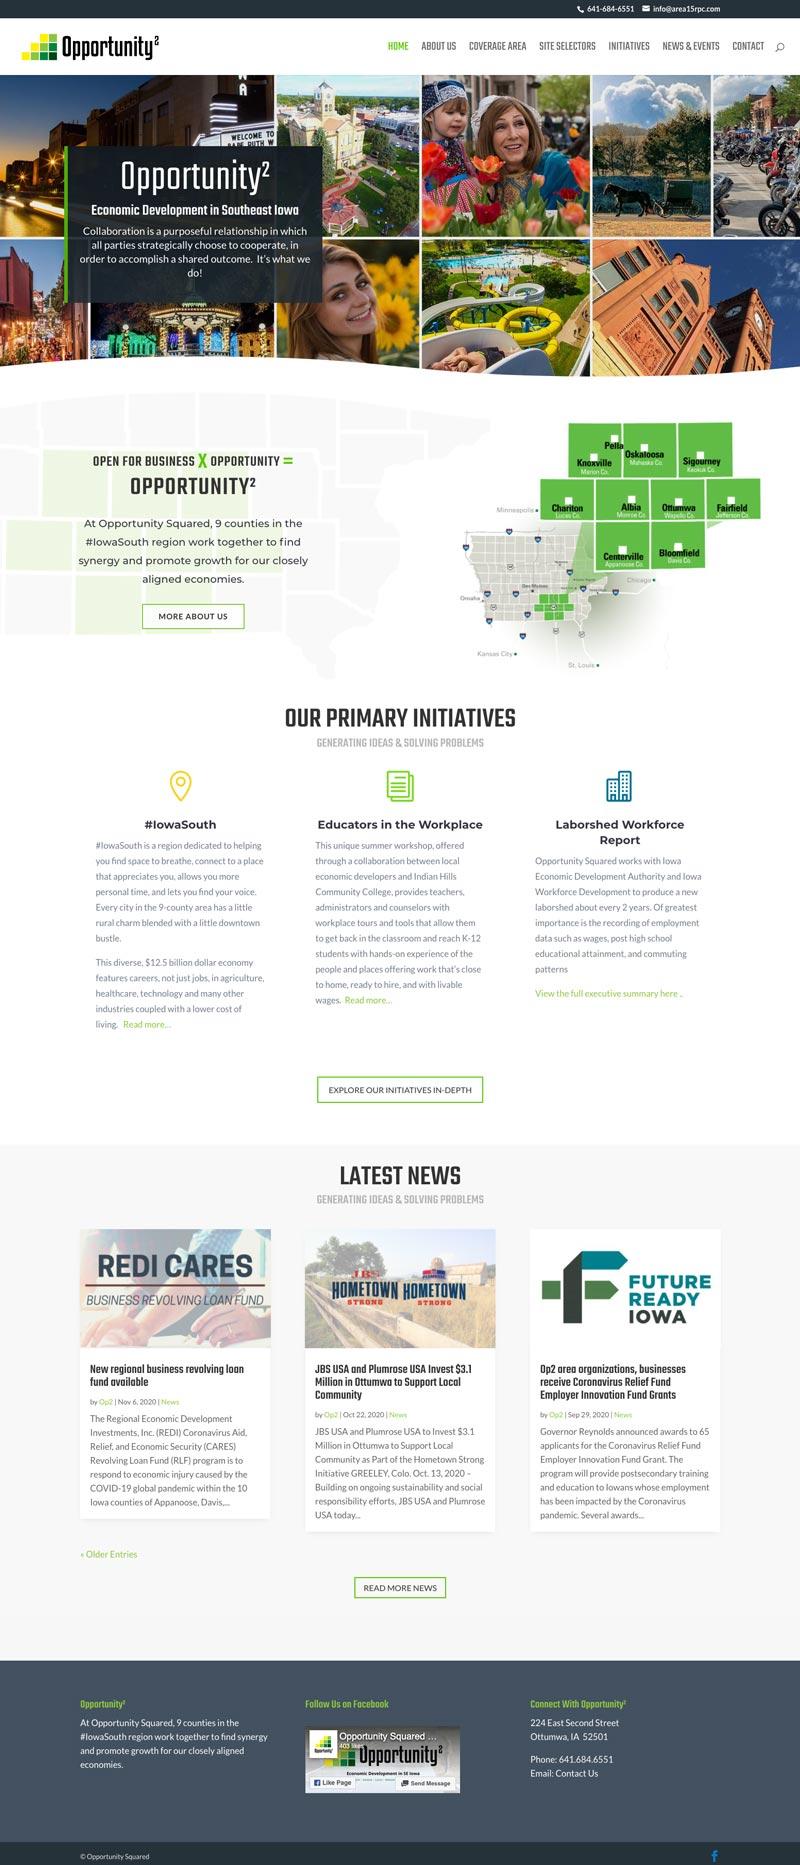 op2iowa.com economic-development website design